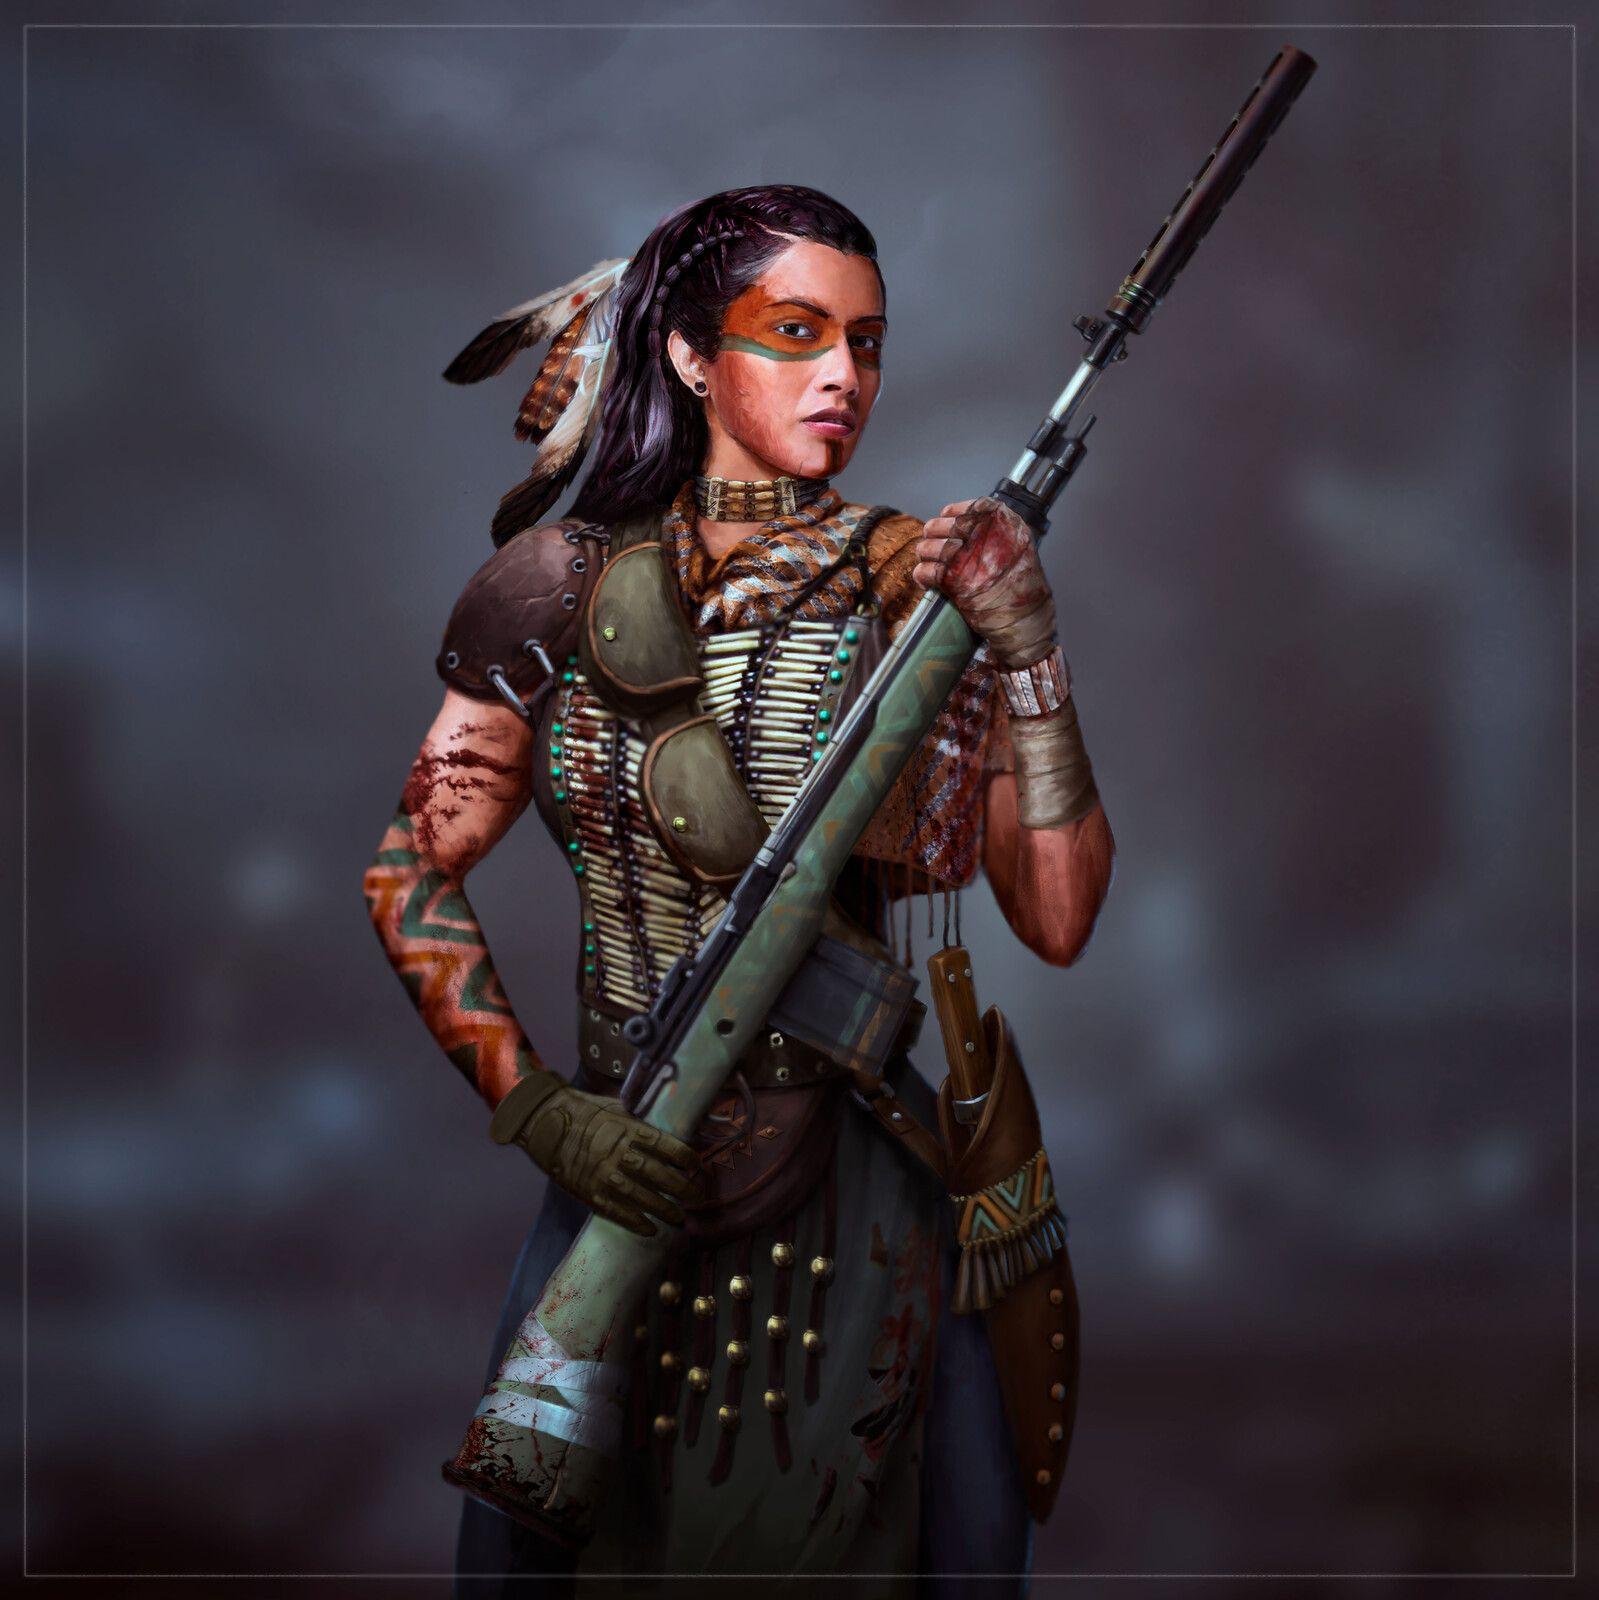 Weak villagers are reduced to slavery. Sniper girl concept (zombie apocalypse), Roman Rogatii on ArtStation at https://www.artstation ...